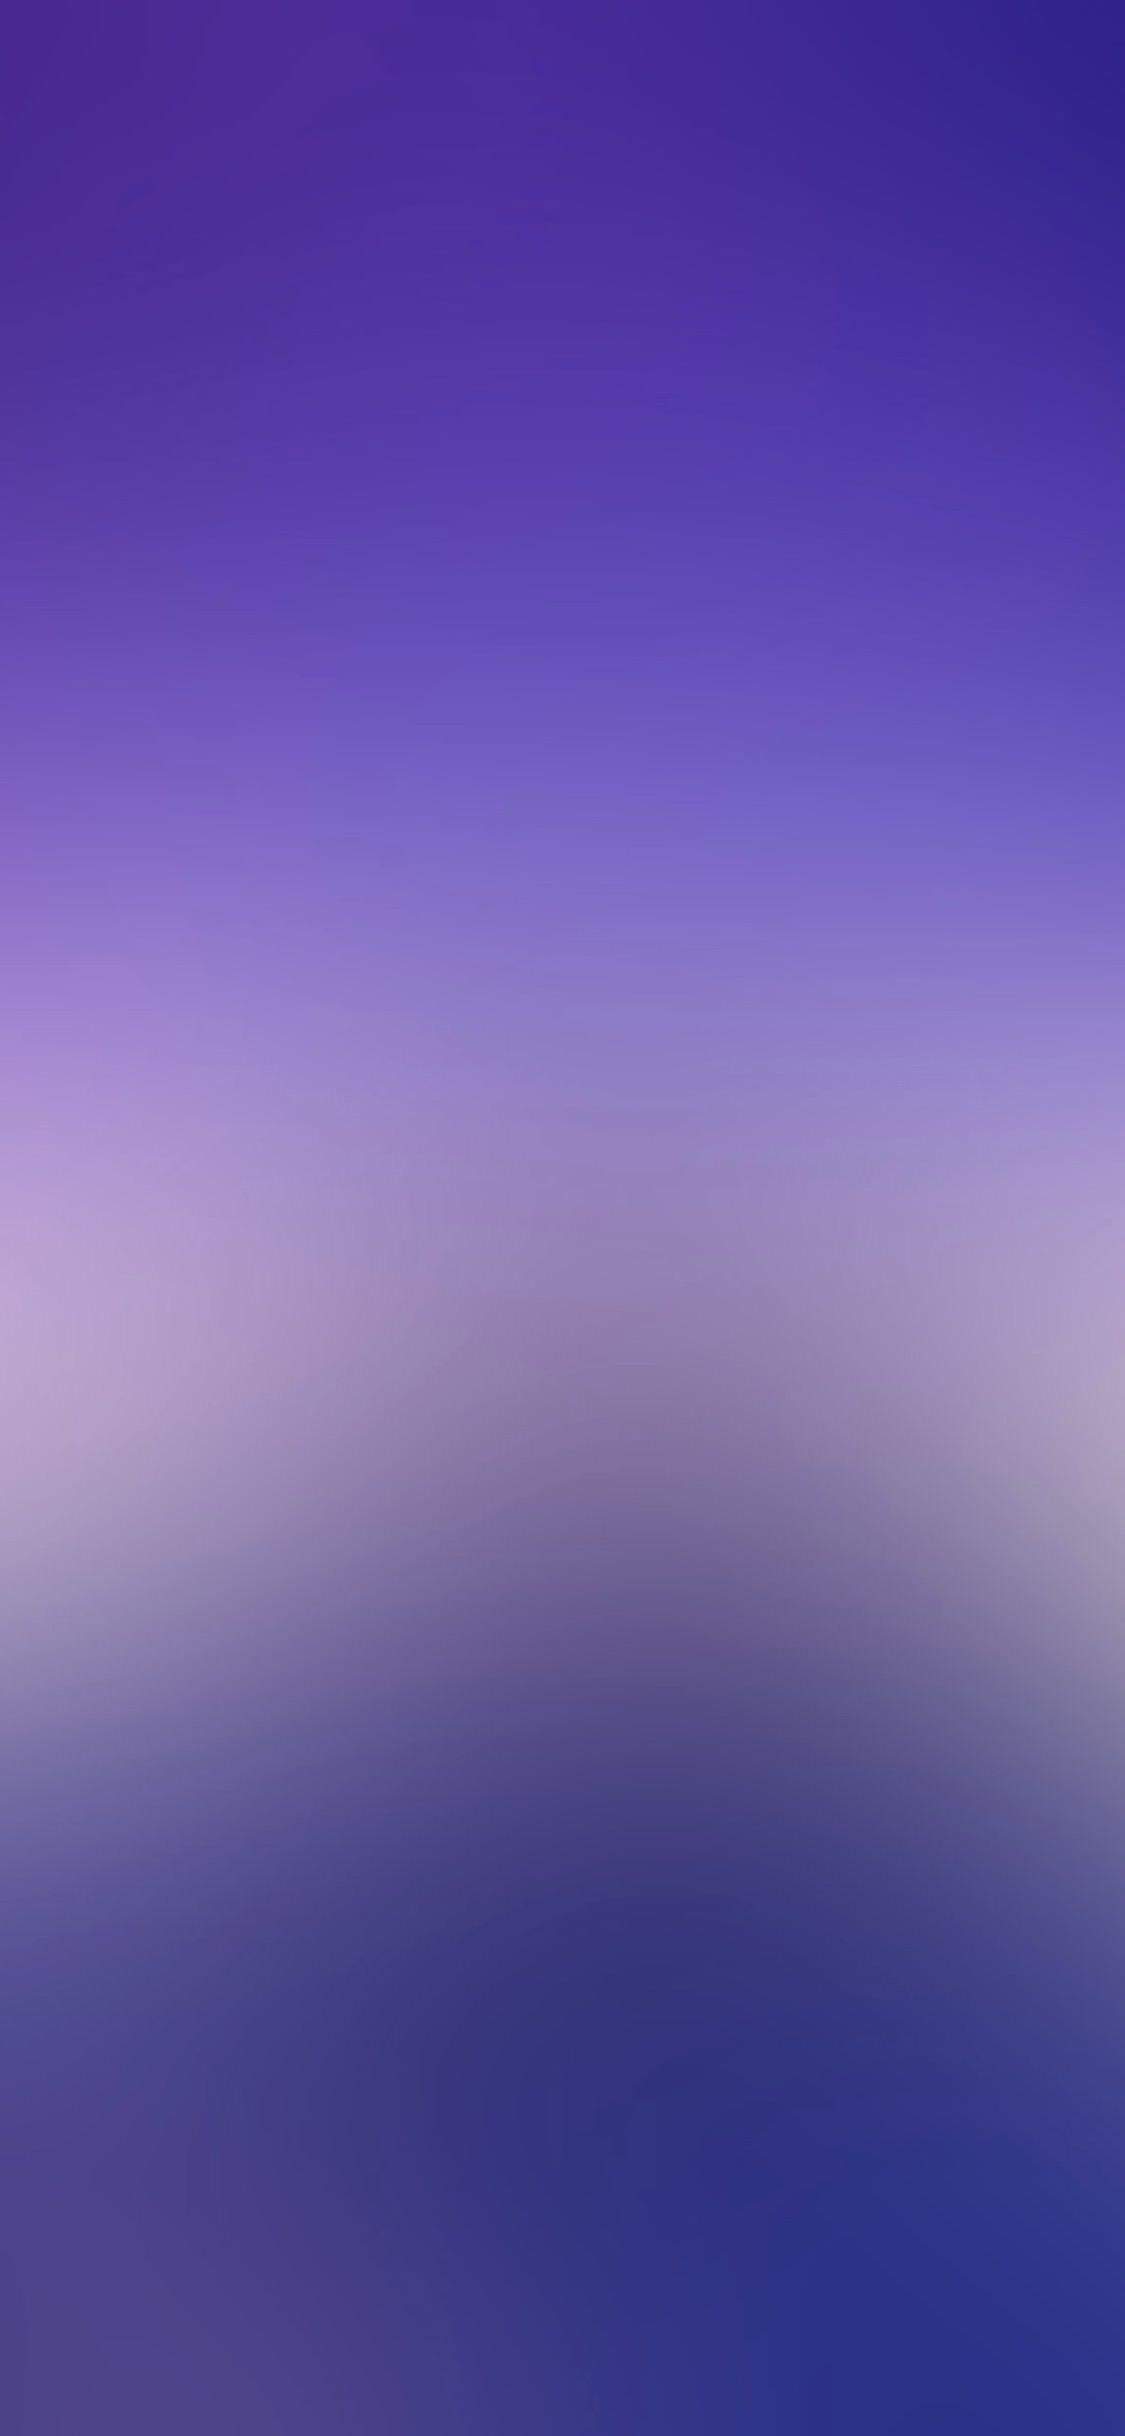 iPhone XS , iPhone X wallpaper 0811